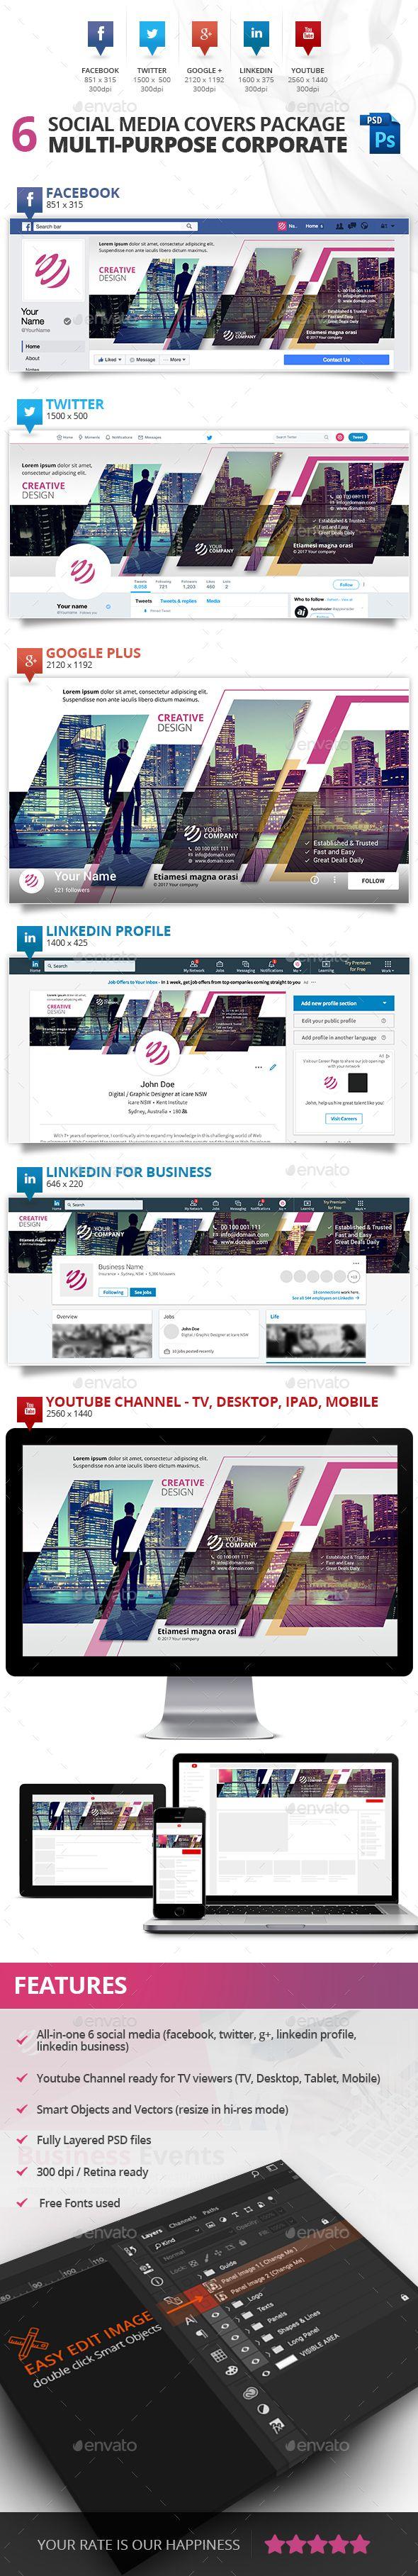 6 Social Media Multi-purpose Professional Covers - Social Media Web Elements